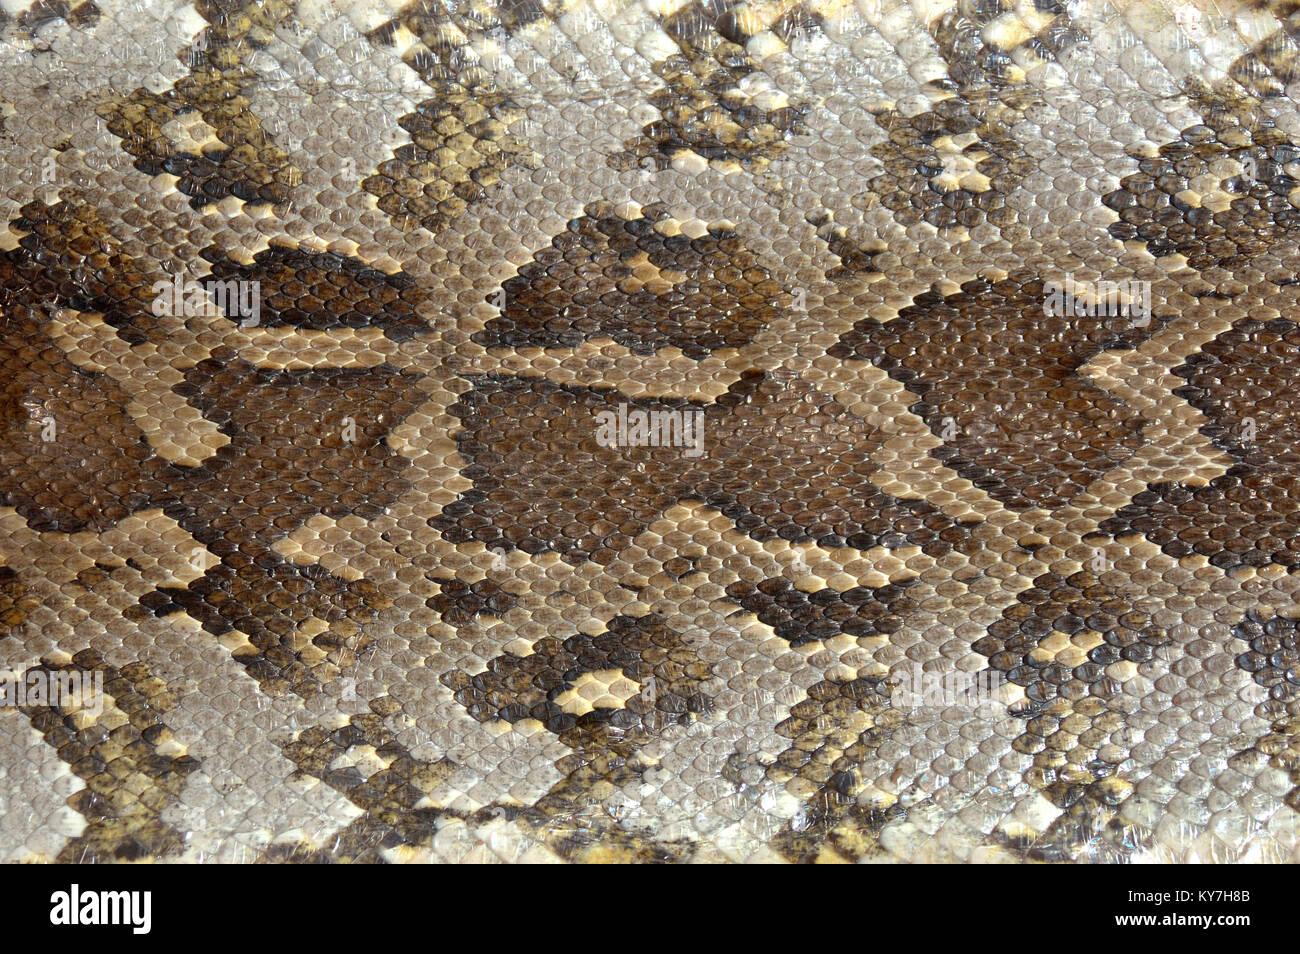 Camouflage pattern on python skin - Stock Image